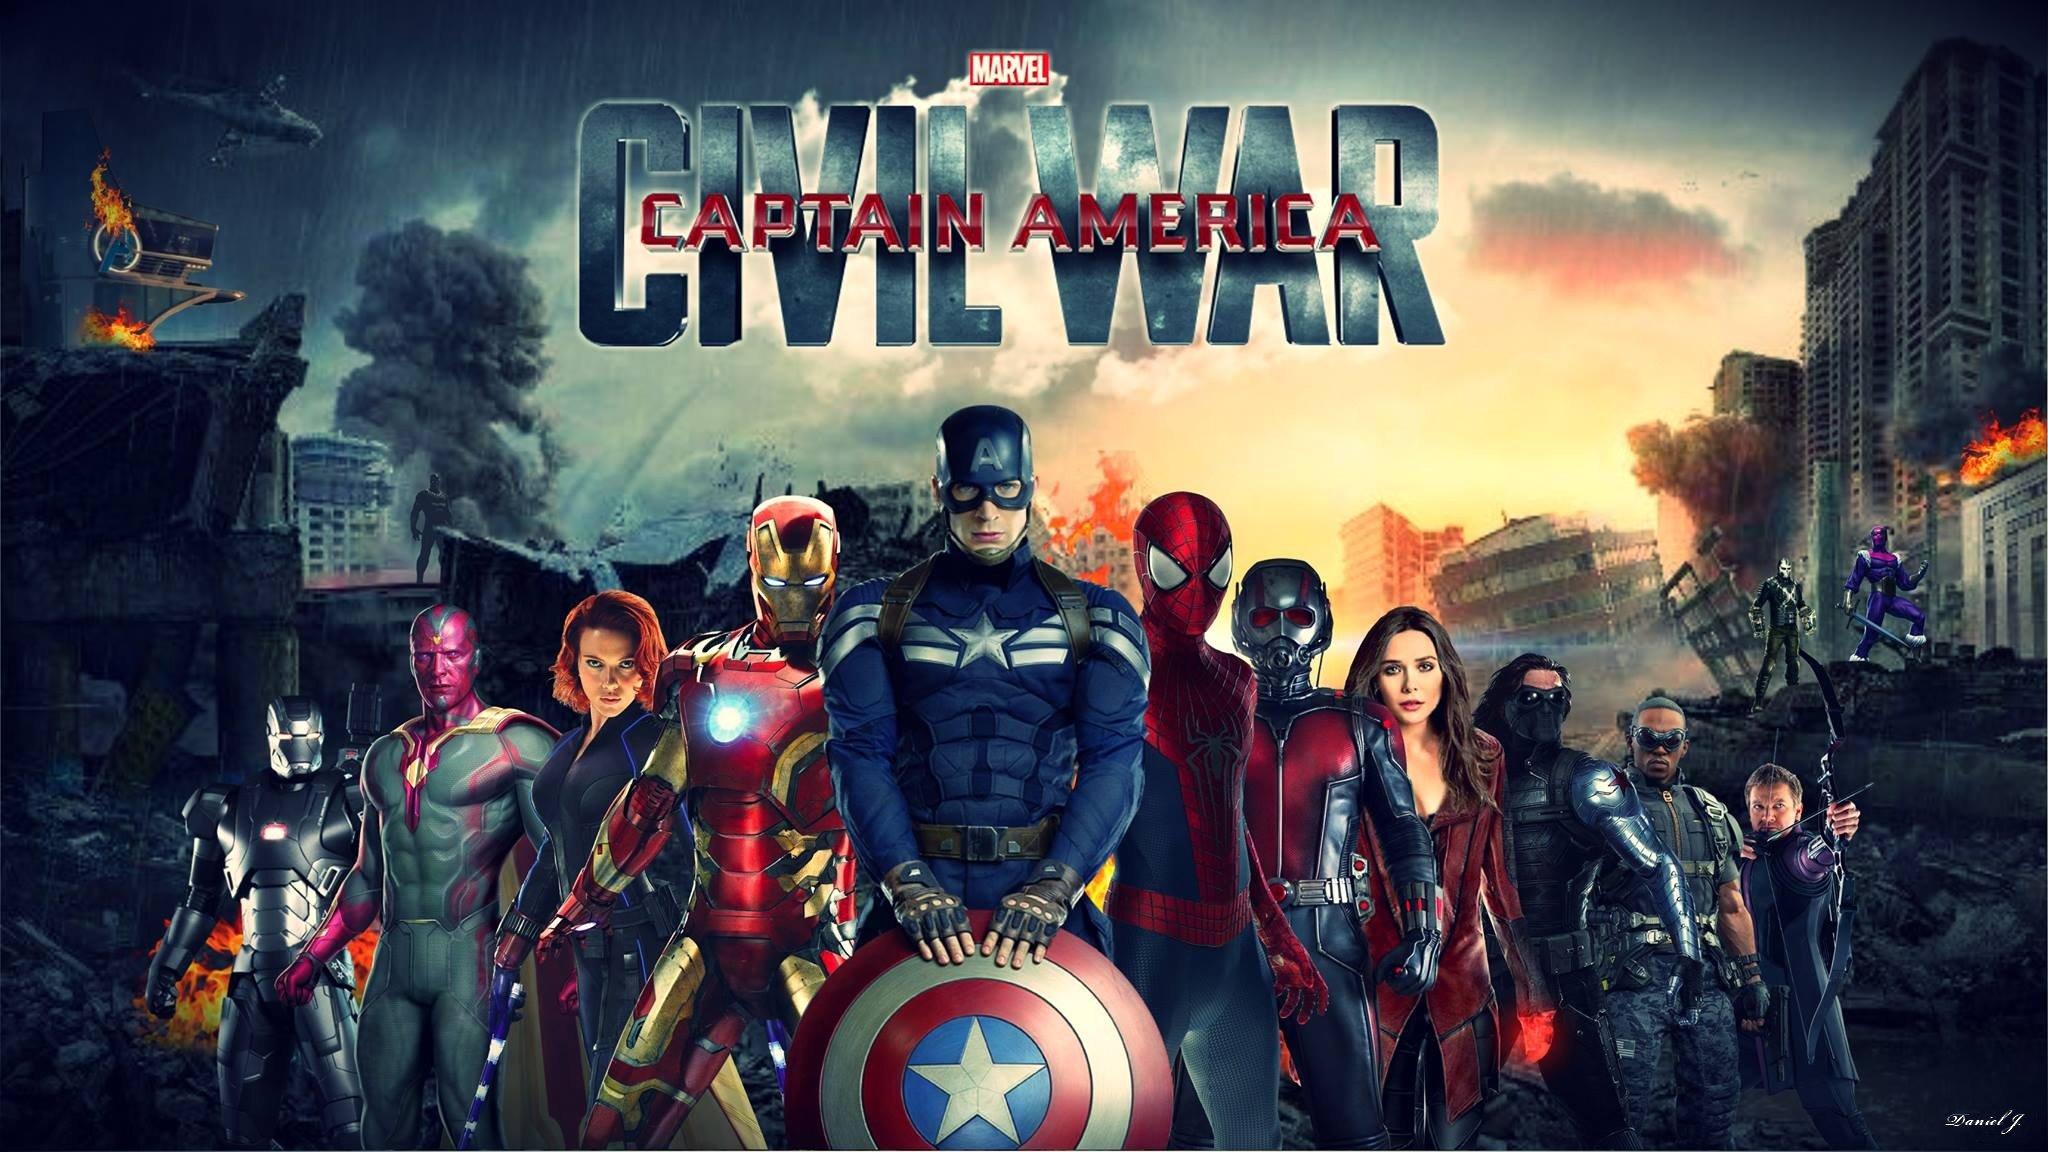 Captain America Civil War Picture Wallpaper Wallpaper HD Desktop 2048x1152